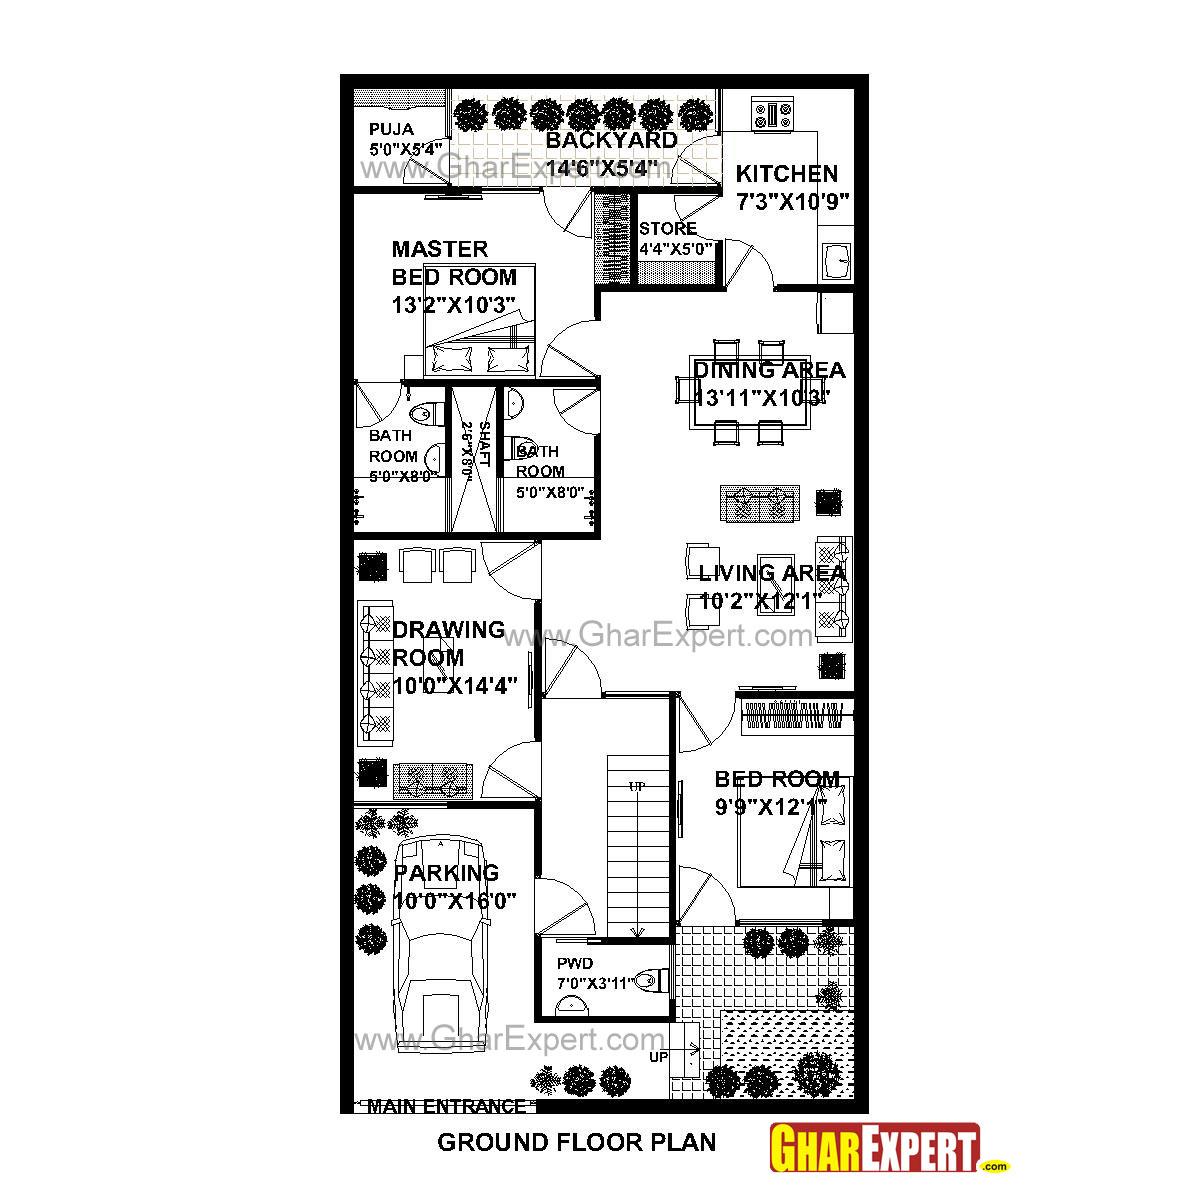 House Plan for 29 Feet by 57 Feet plot (Plot Size 183